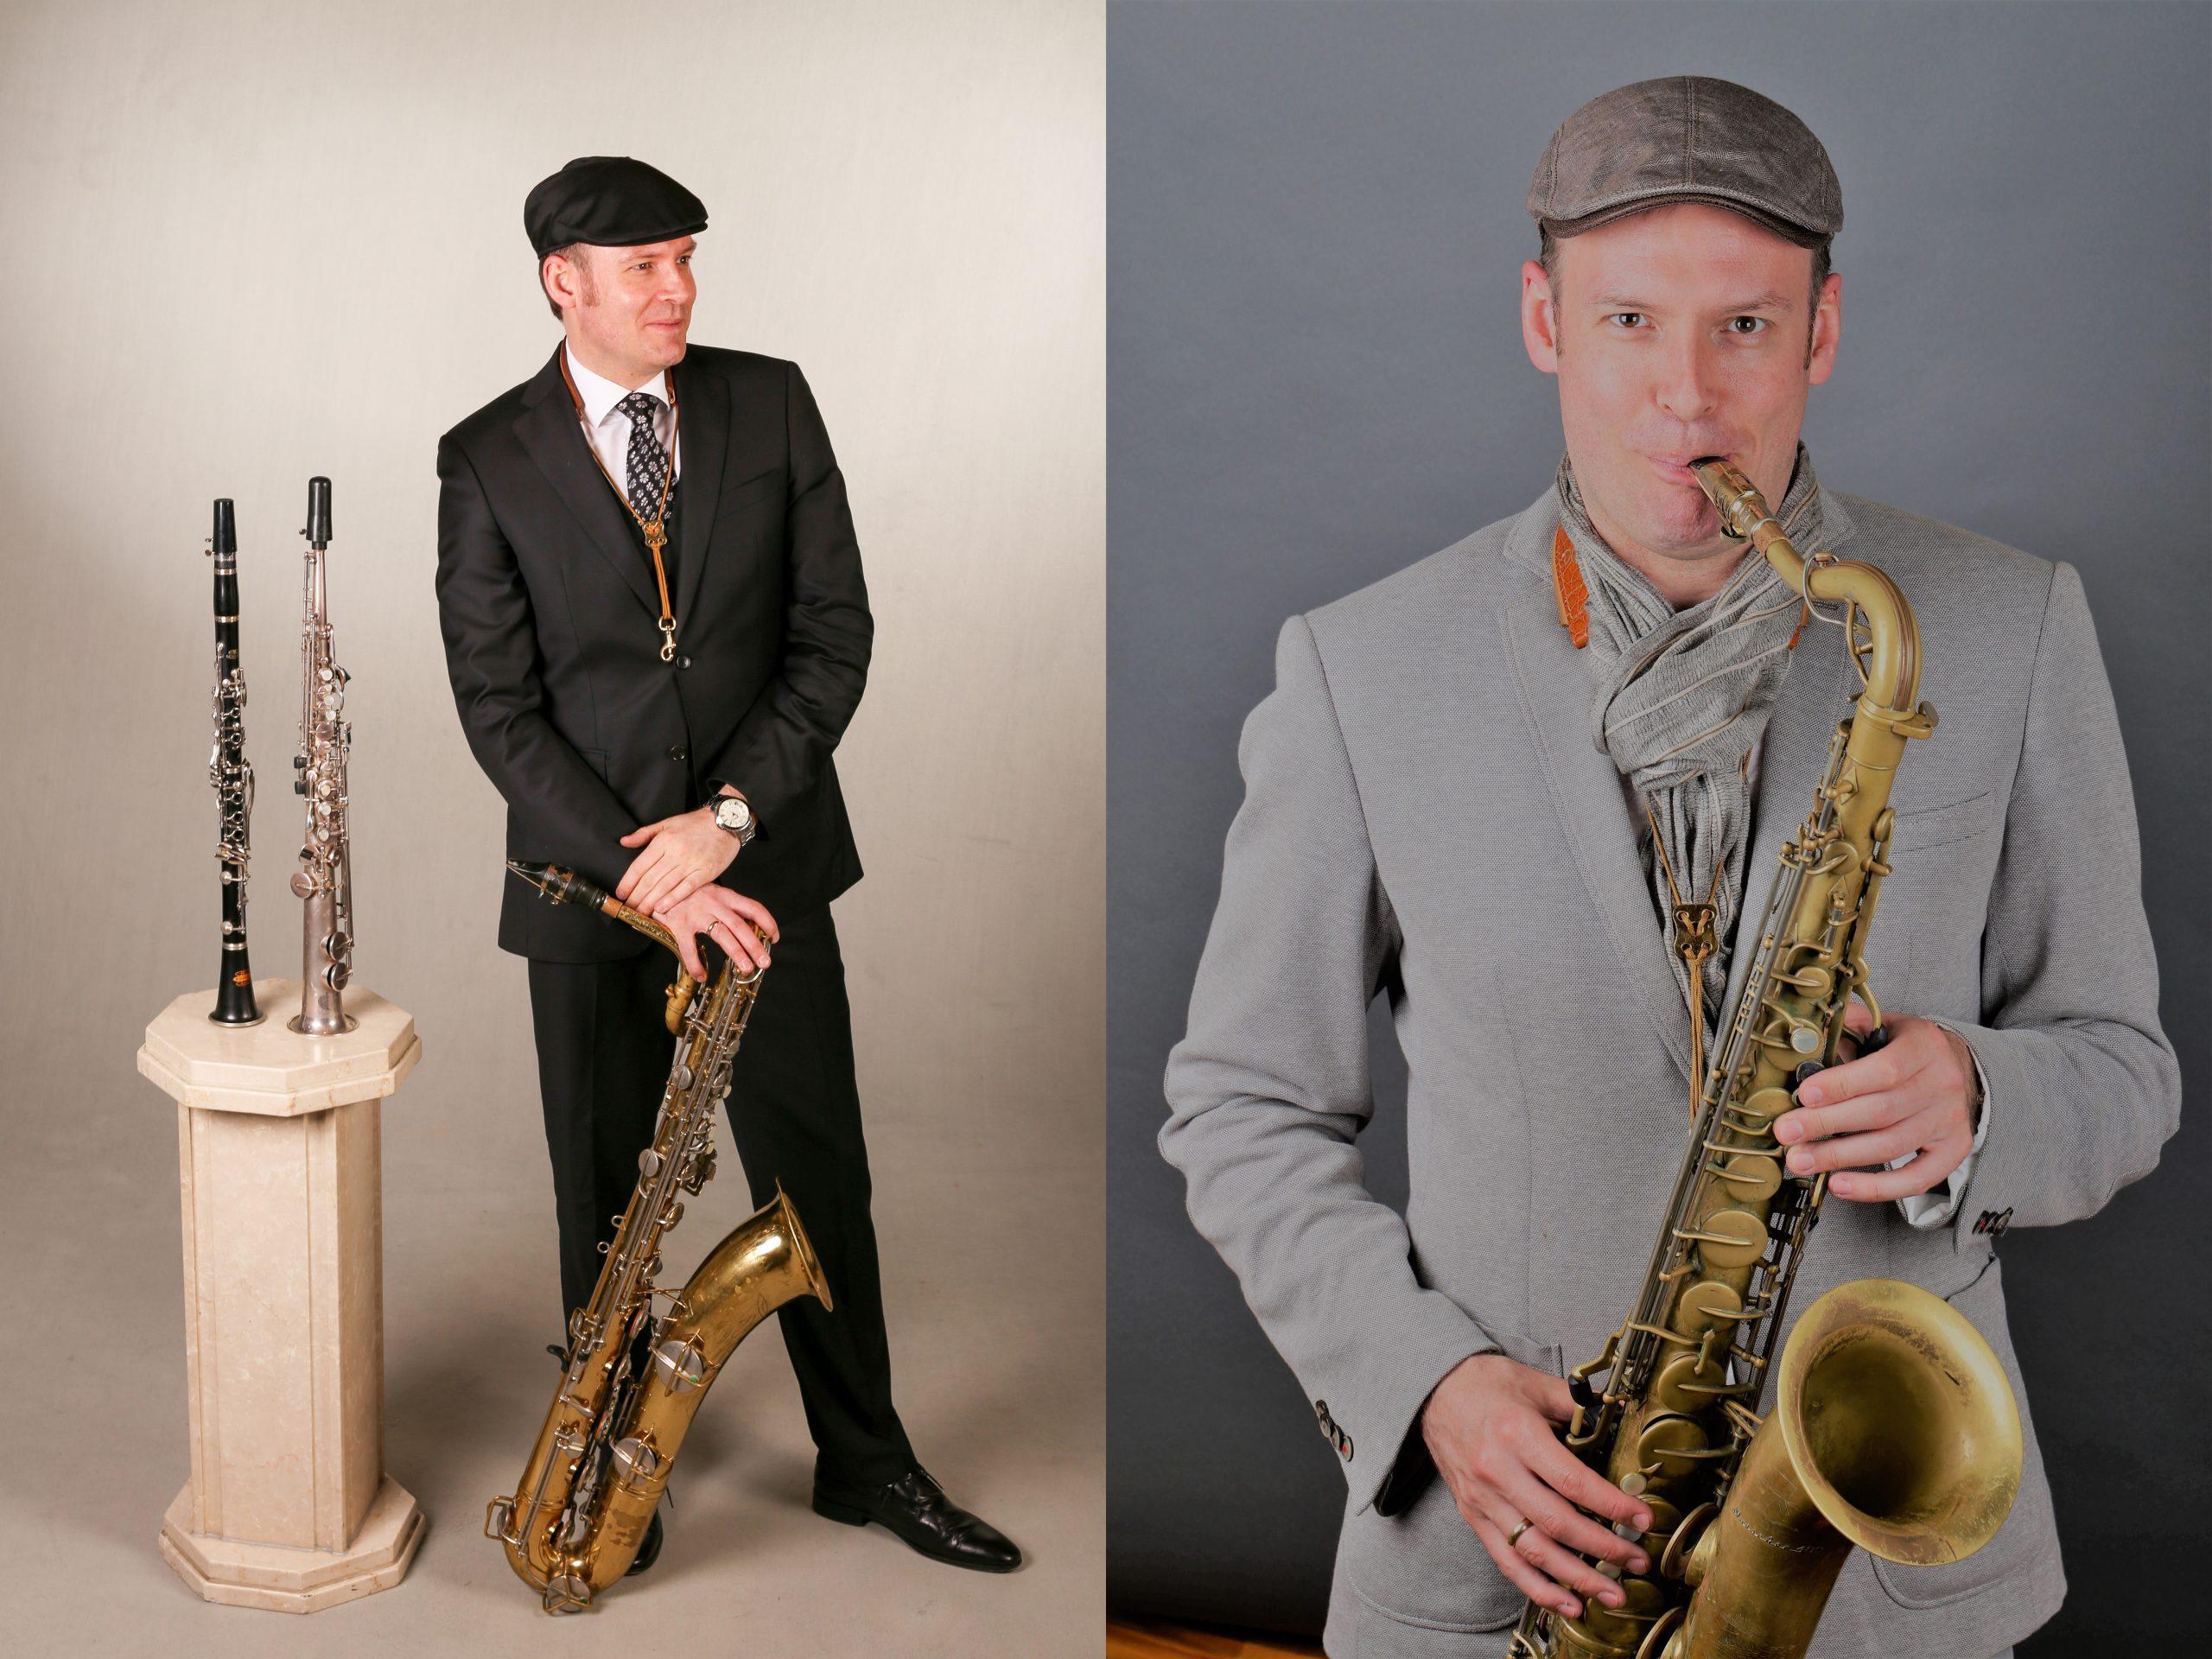 Saxophonist David Milzow mit Tenorsaxophon, Baritonsaxophon, Sopransaxophon, Klarinette